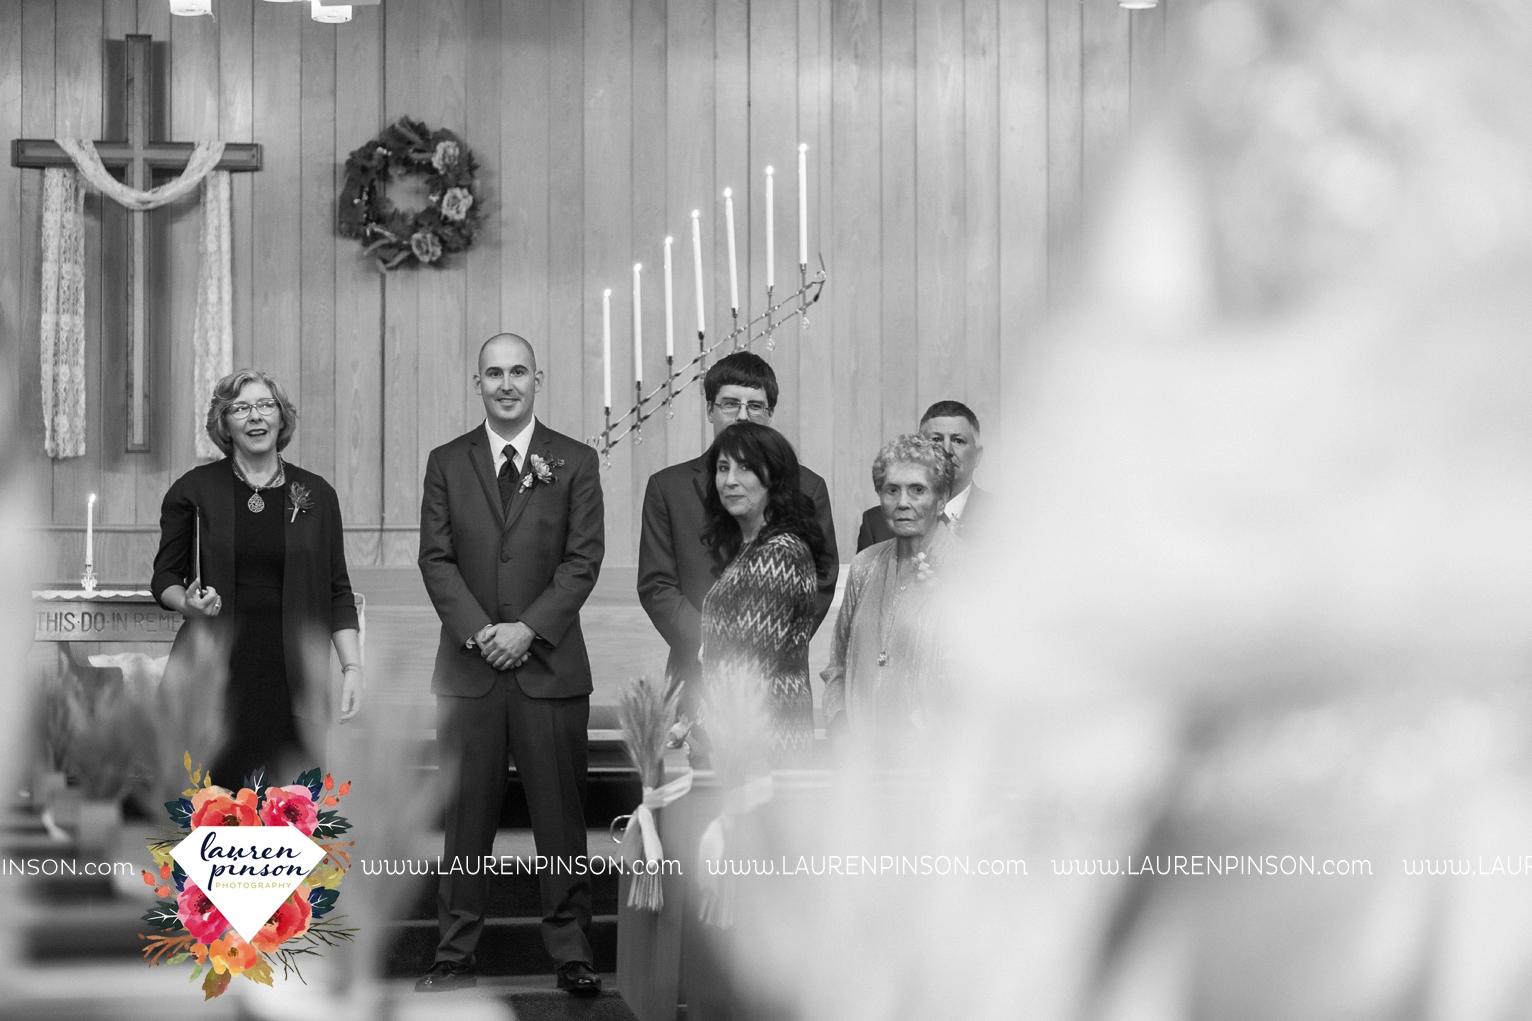 kemp-center-for-the-arts-wichita-falls-texas-wedding-photographer-fall-wedding-pumpkins-154.jpg